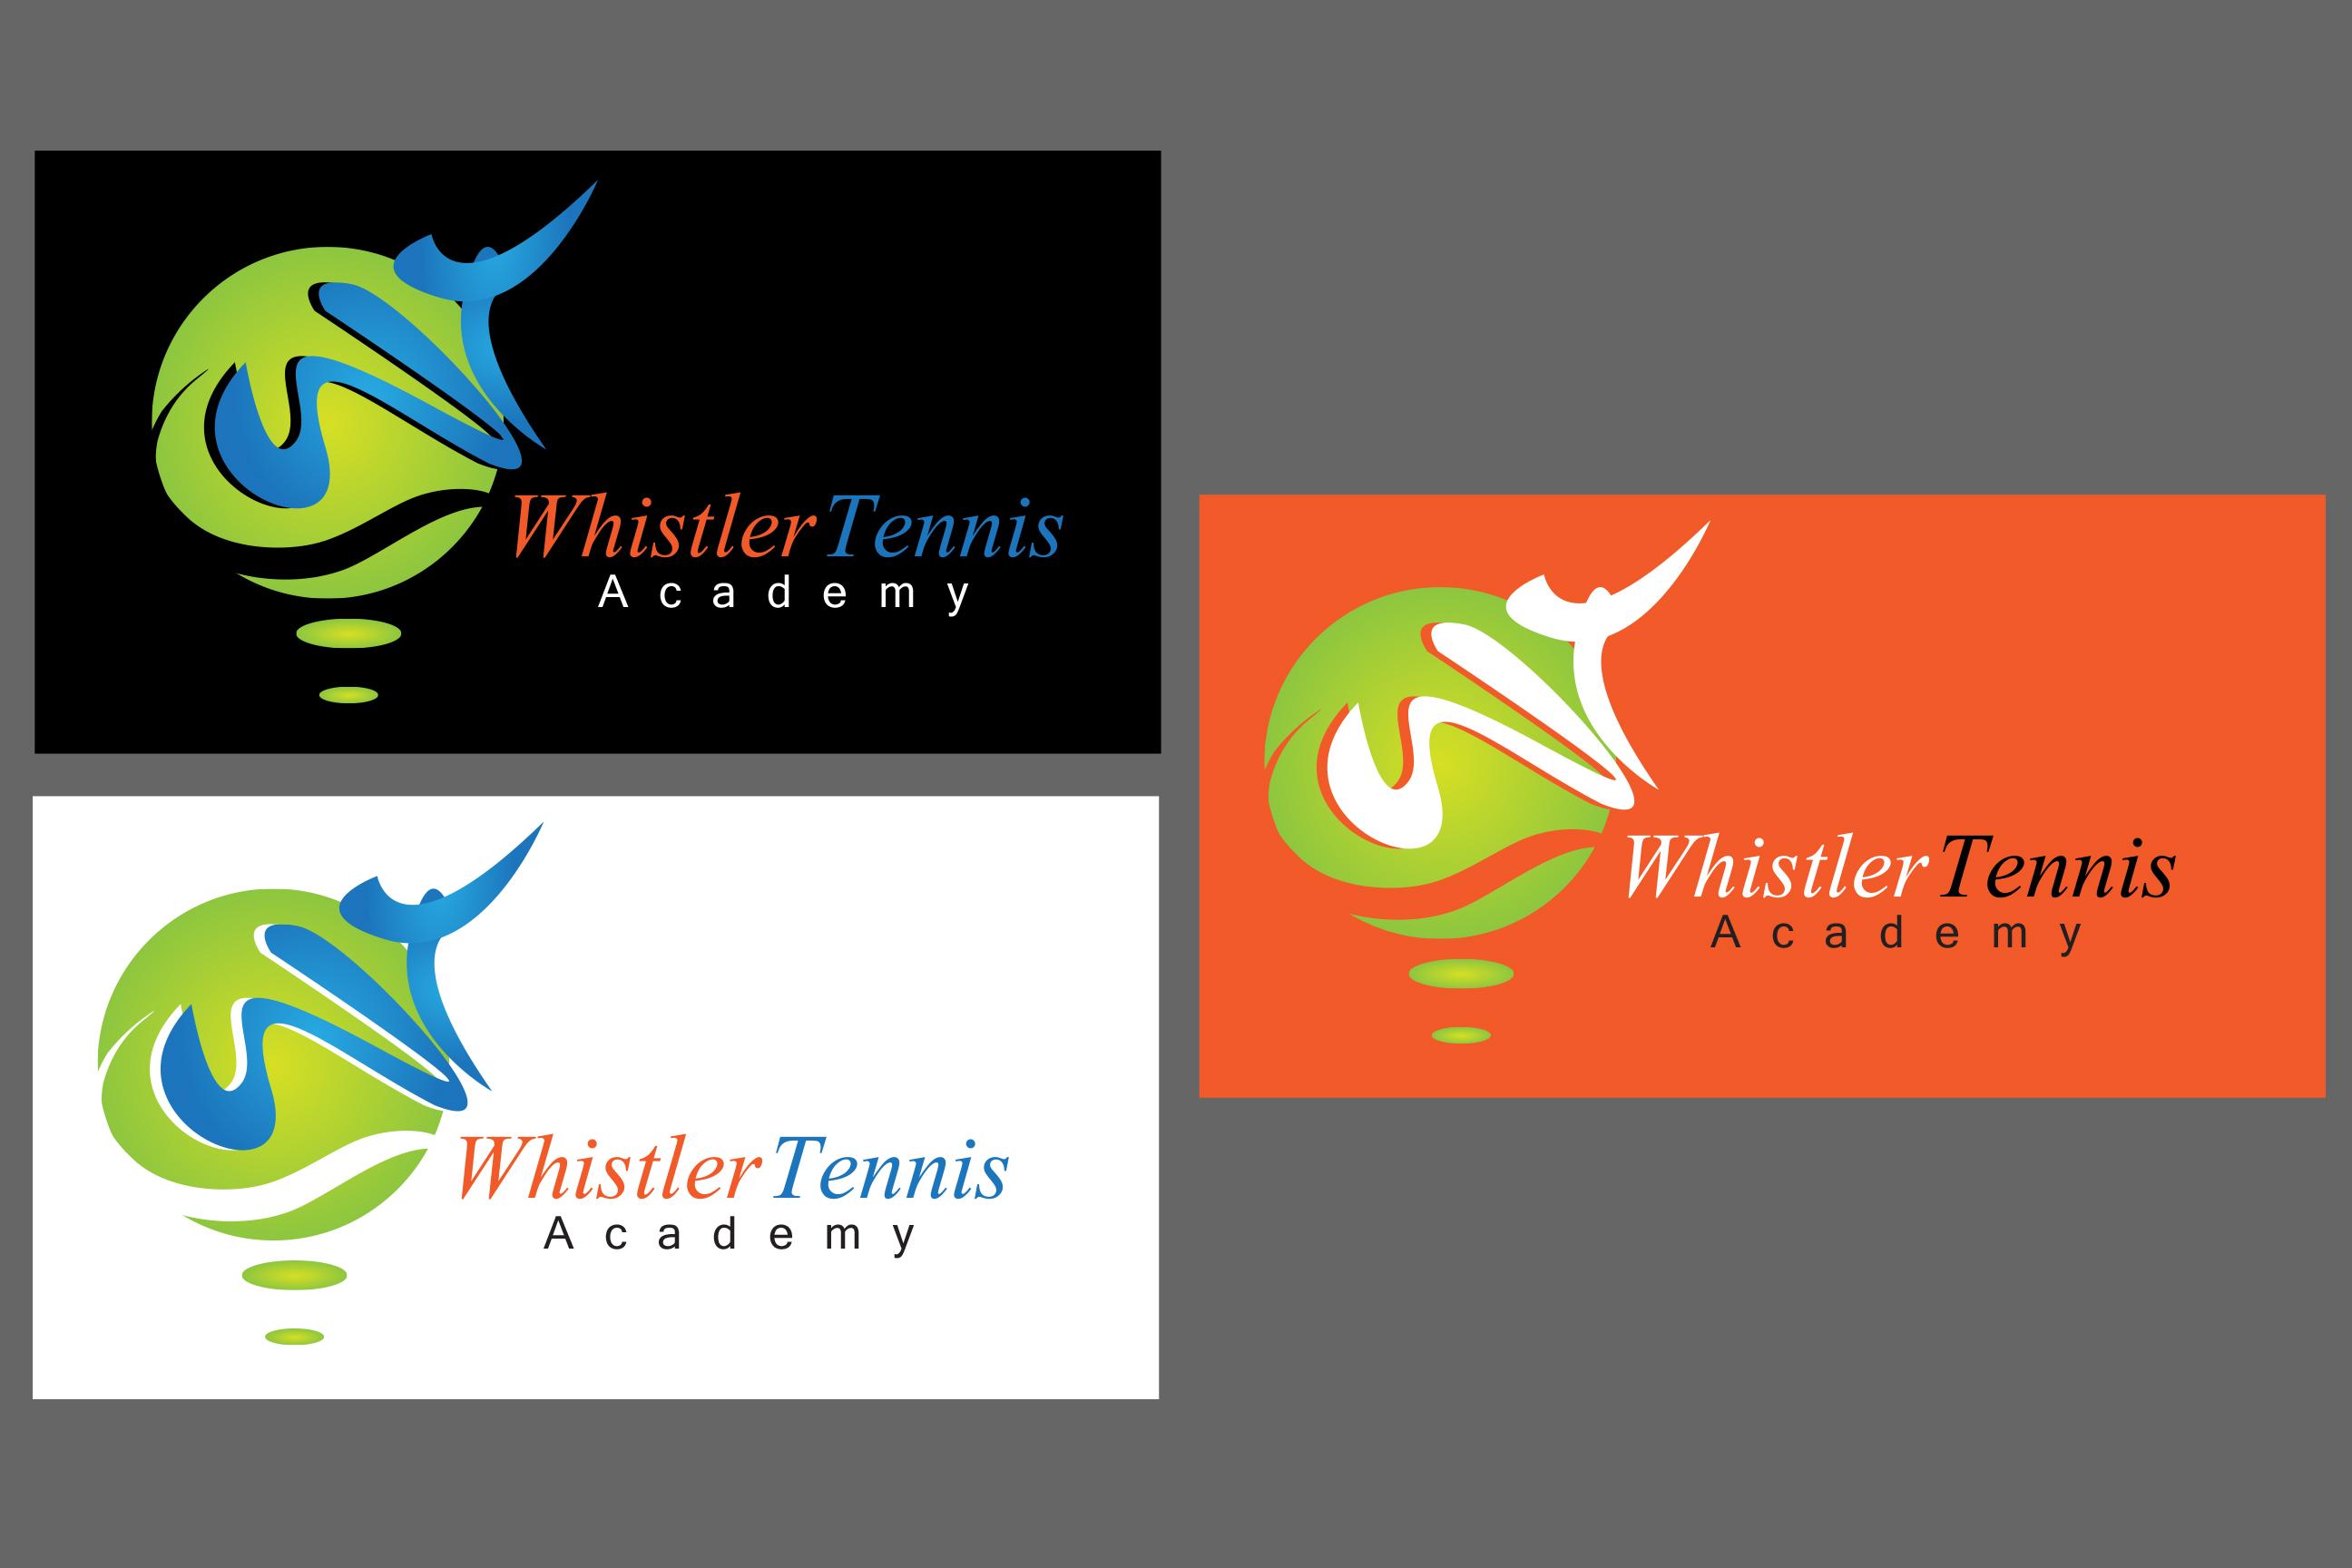 Logo Design by Leonard Anthony Alloso - Entry No. 174 in the Logo Design Contest Imaginative Logo Design for Whistler Tennis Academy.